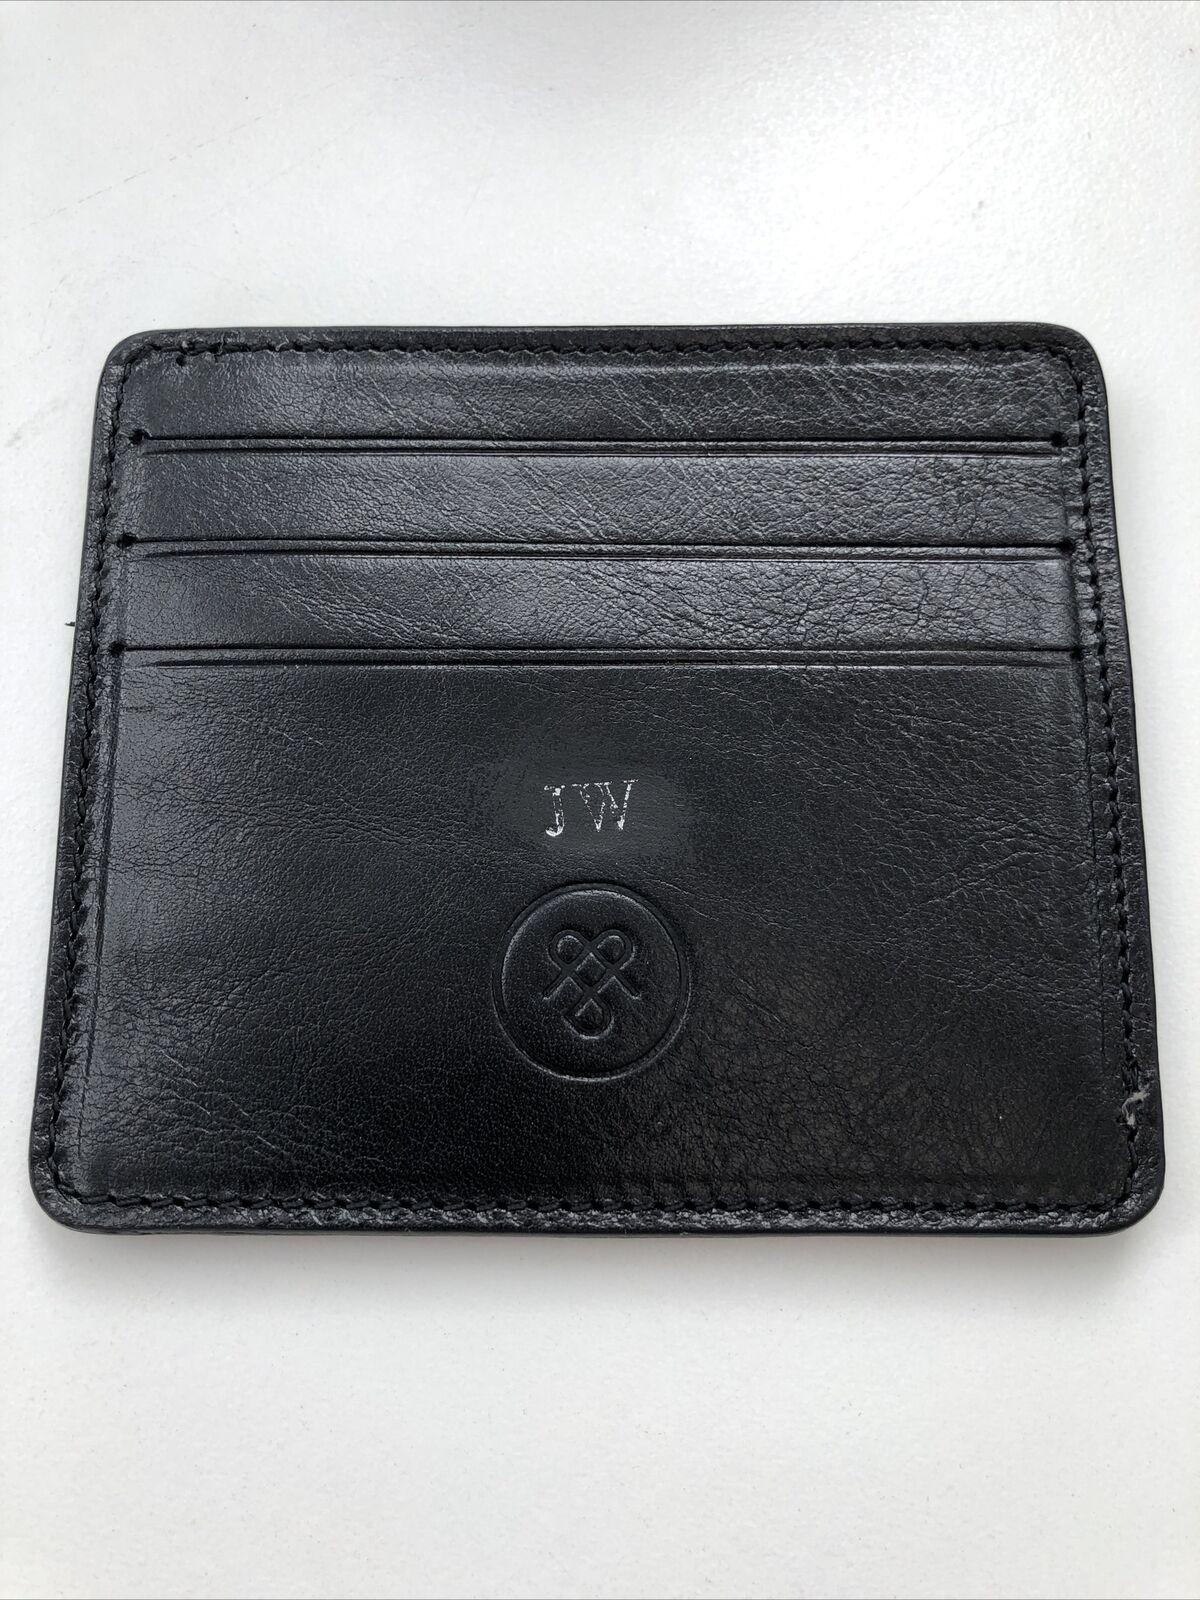 Maxwell Scott Luxury Italian Leather Black Marco Card Holder Rrp